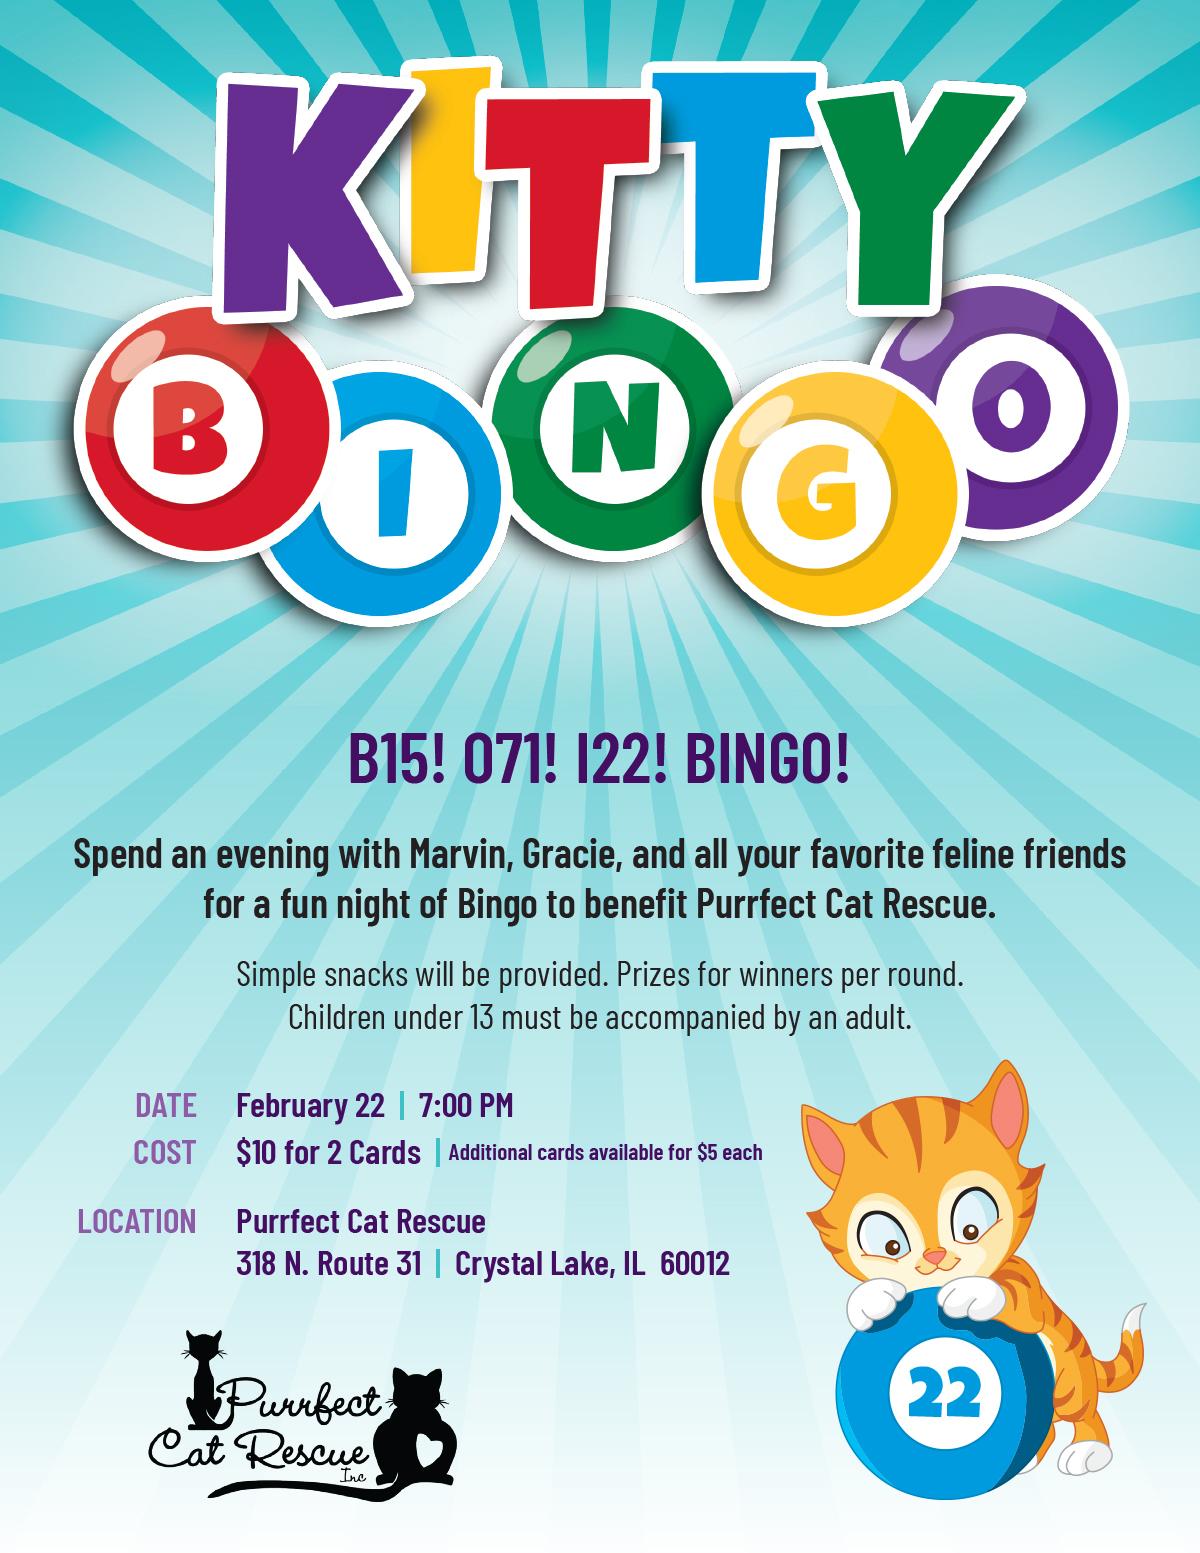 kitty_bingo_flyer_1200x1553.jpg